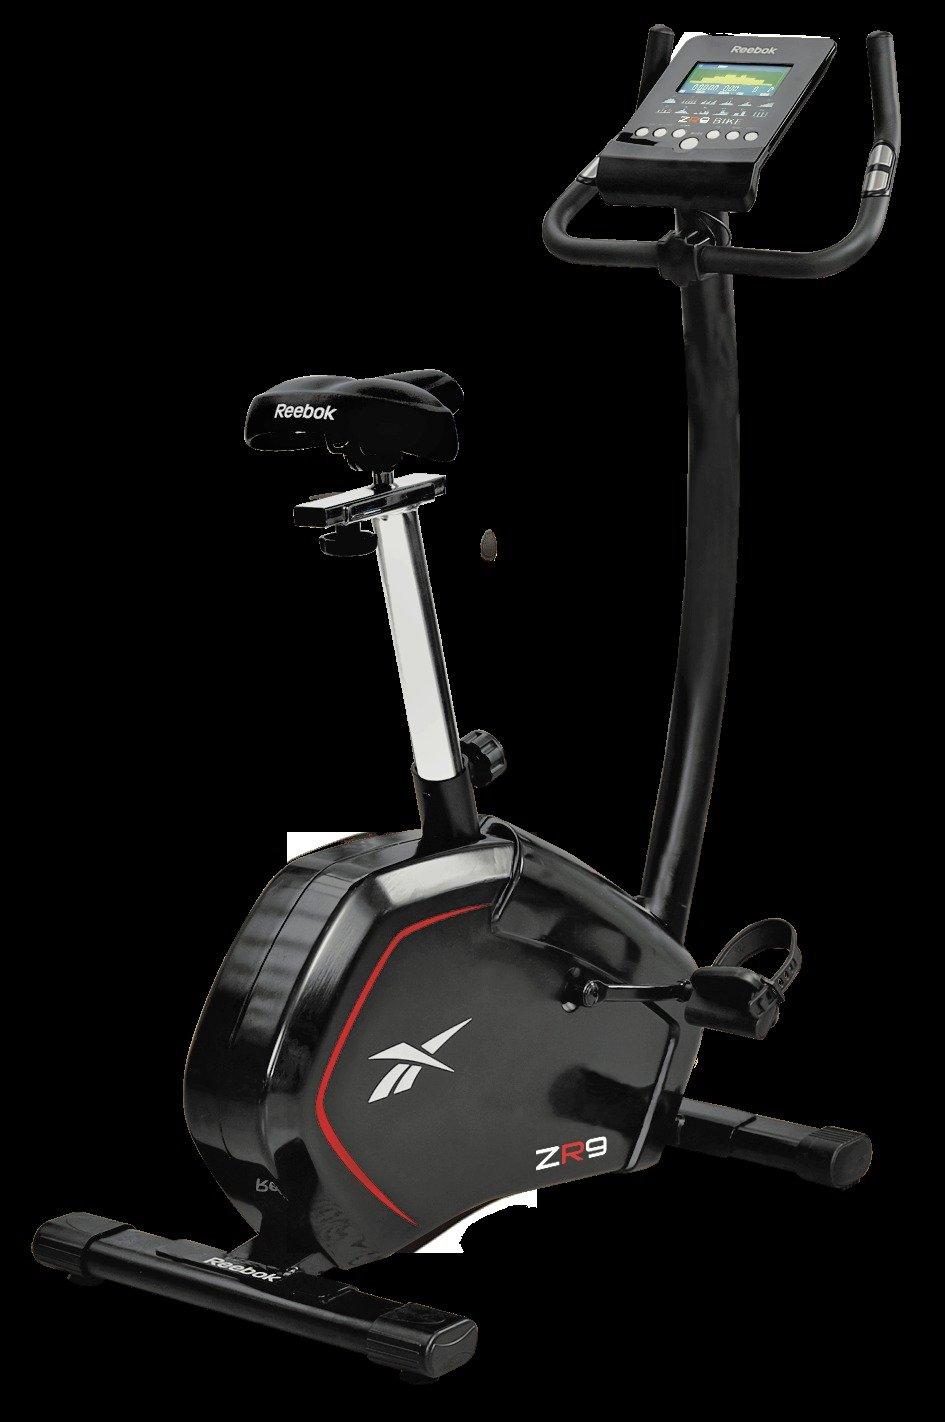 Reebok - ZR9 Exercise Bike